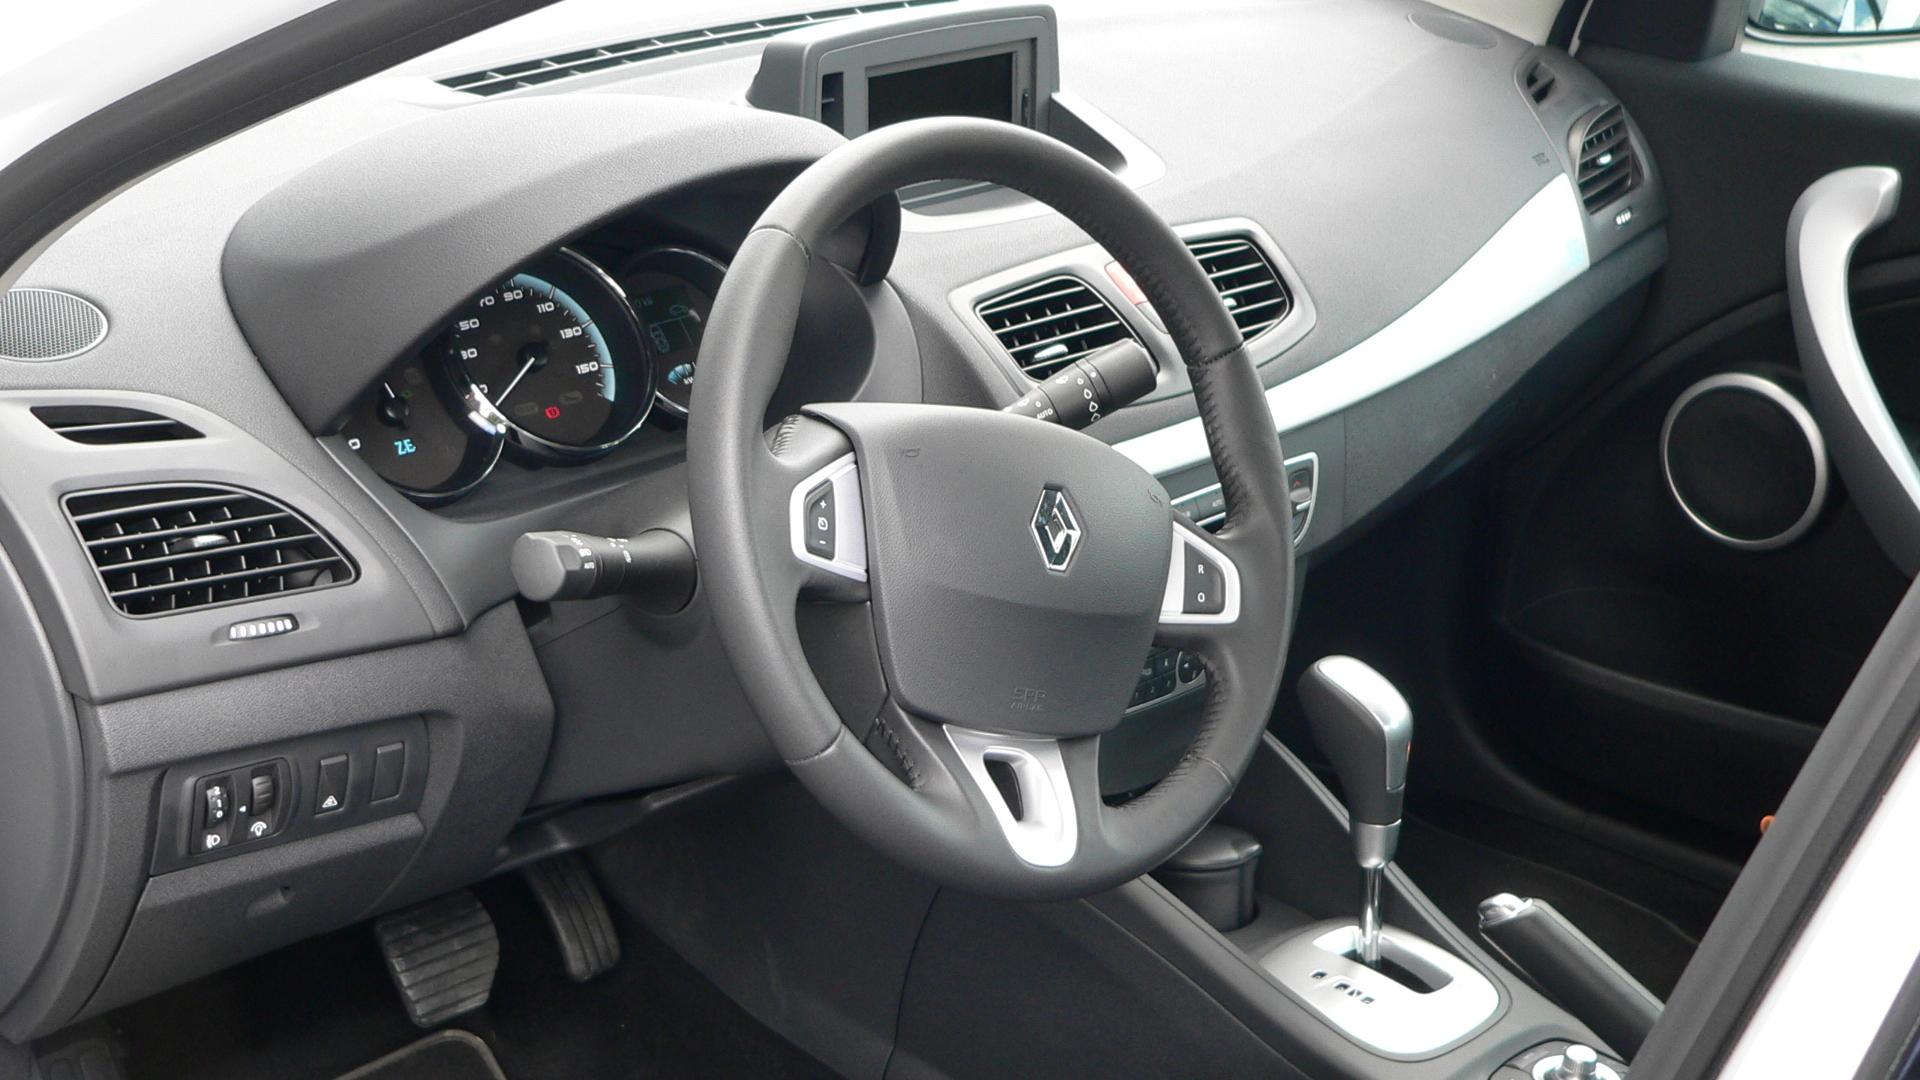 2012 Renault Fluence Z.E. Prototype